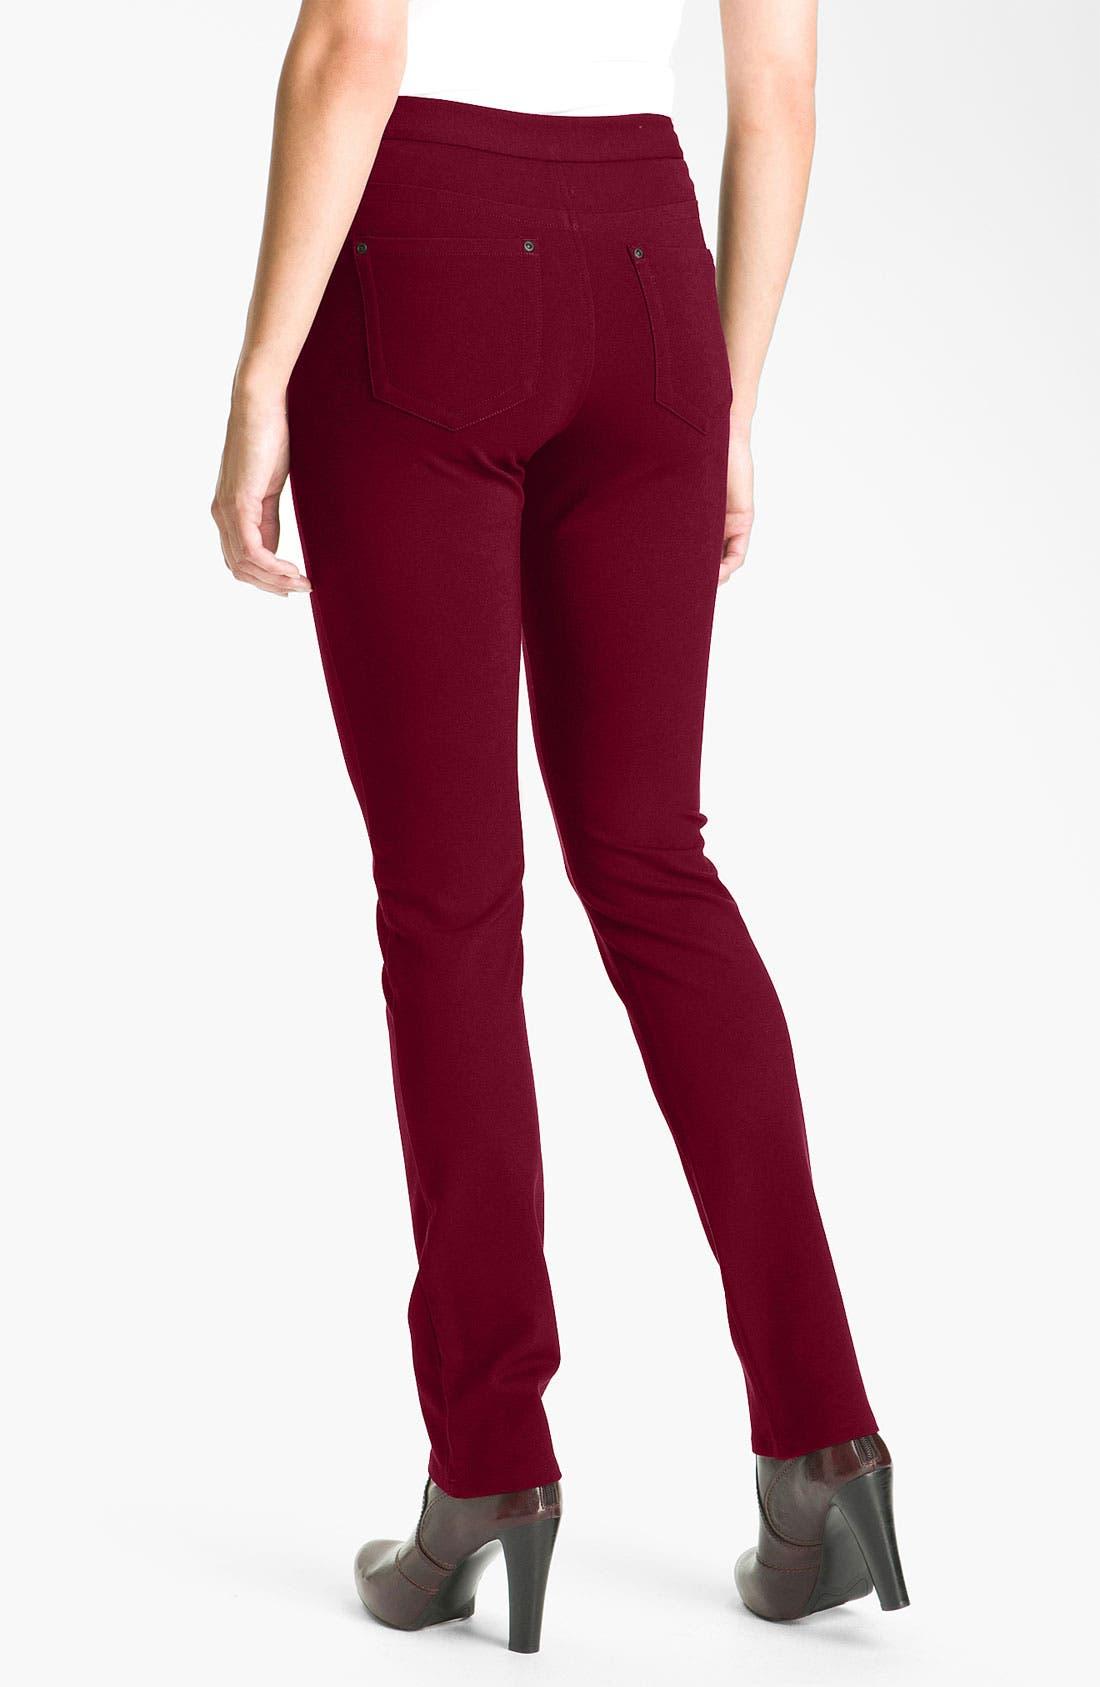 'Samantha' Stretch Ponte Knit Pants,                             Alternate thumbnail 2, color,                             Plumberry